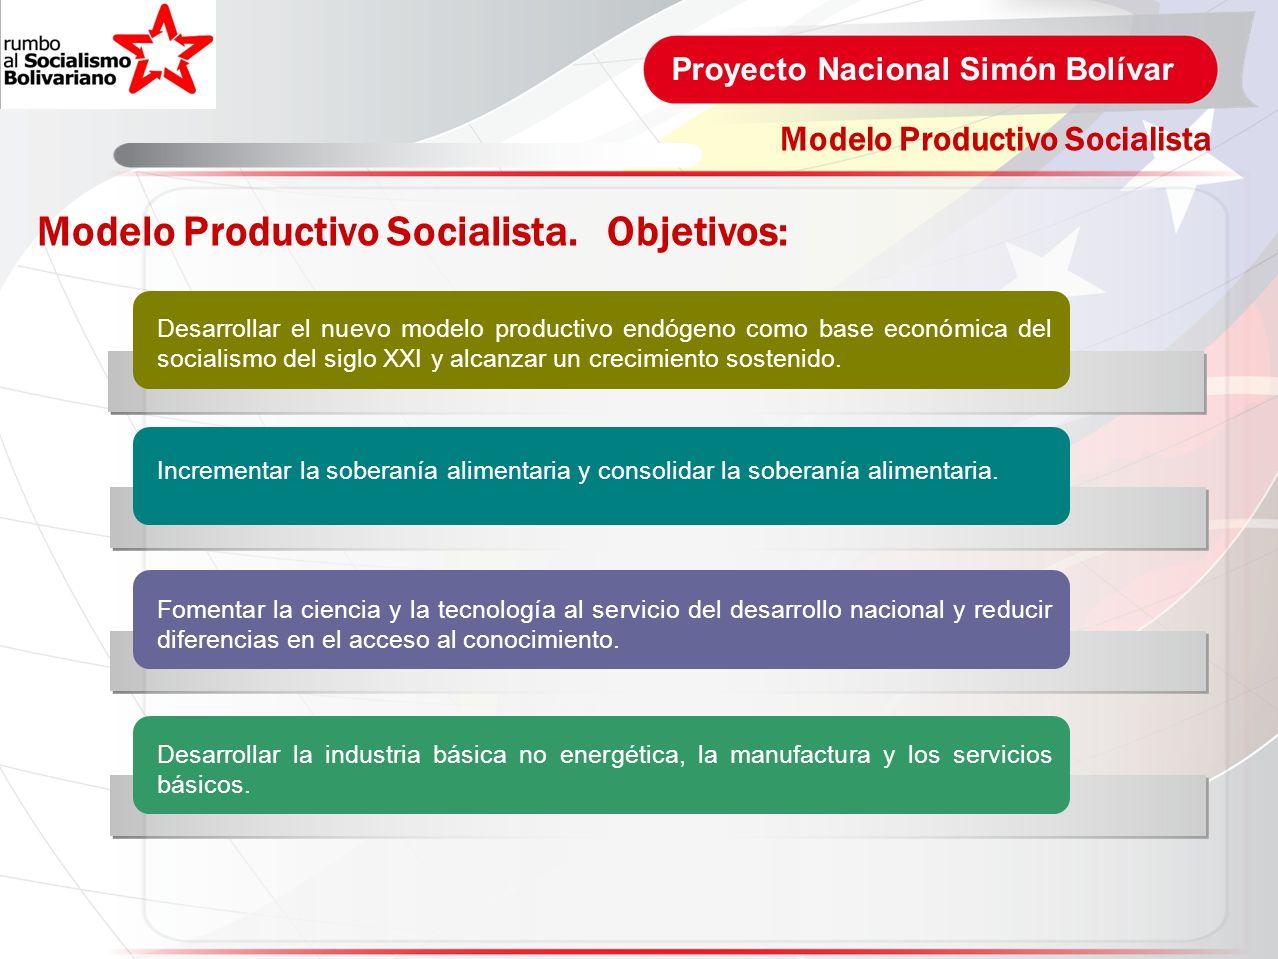 Modelo Productivo Socialista. Objetivos: